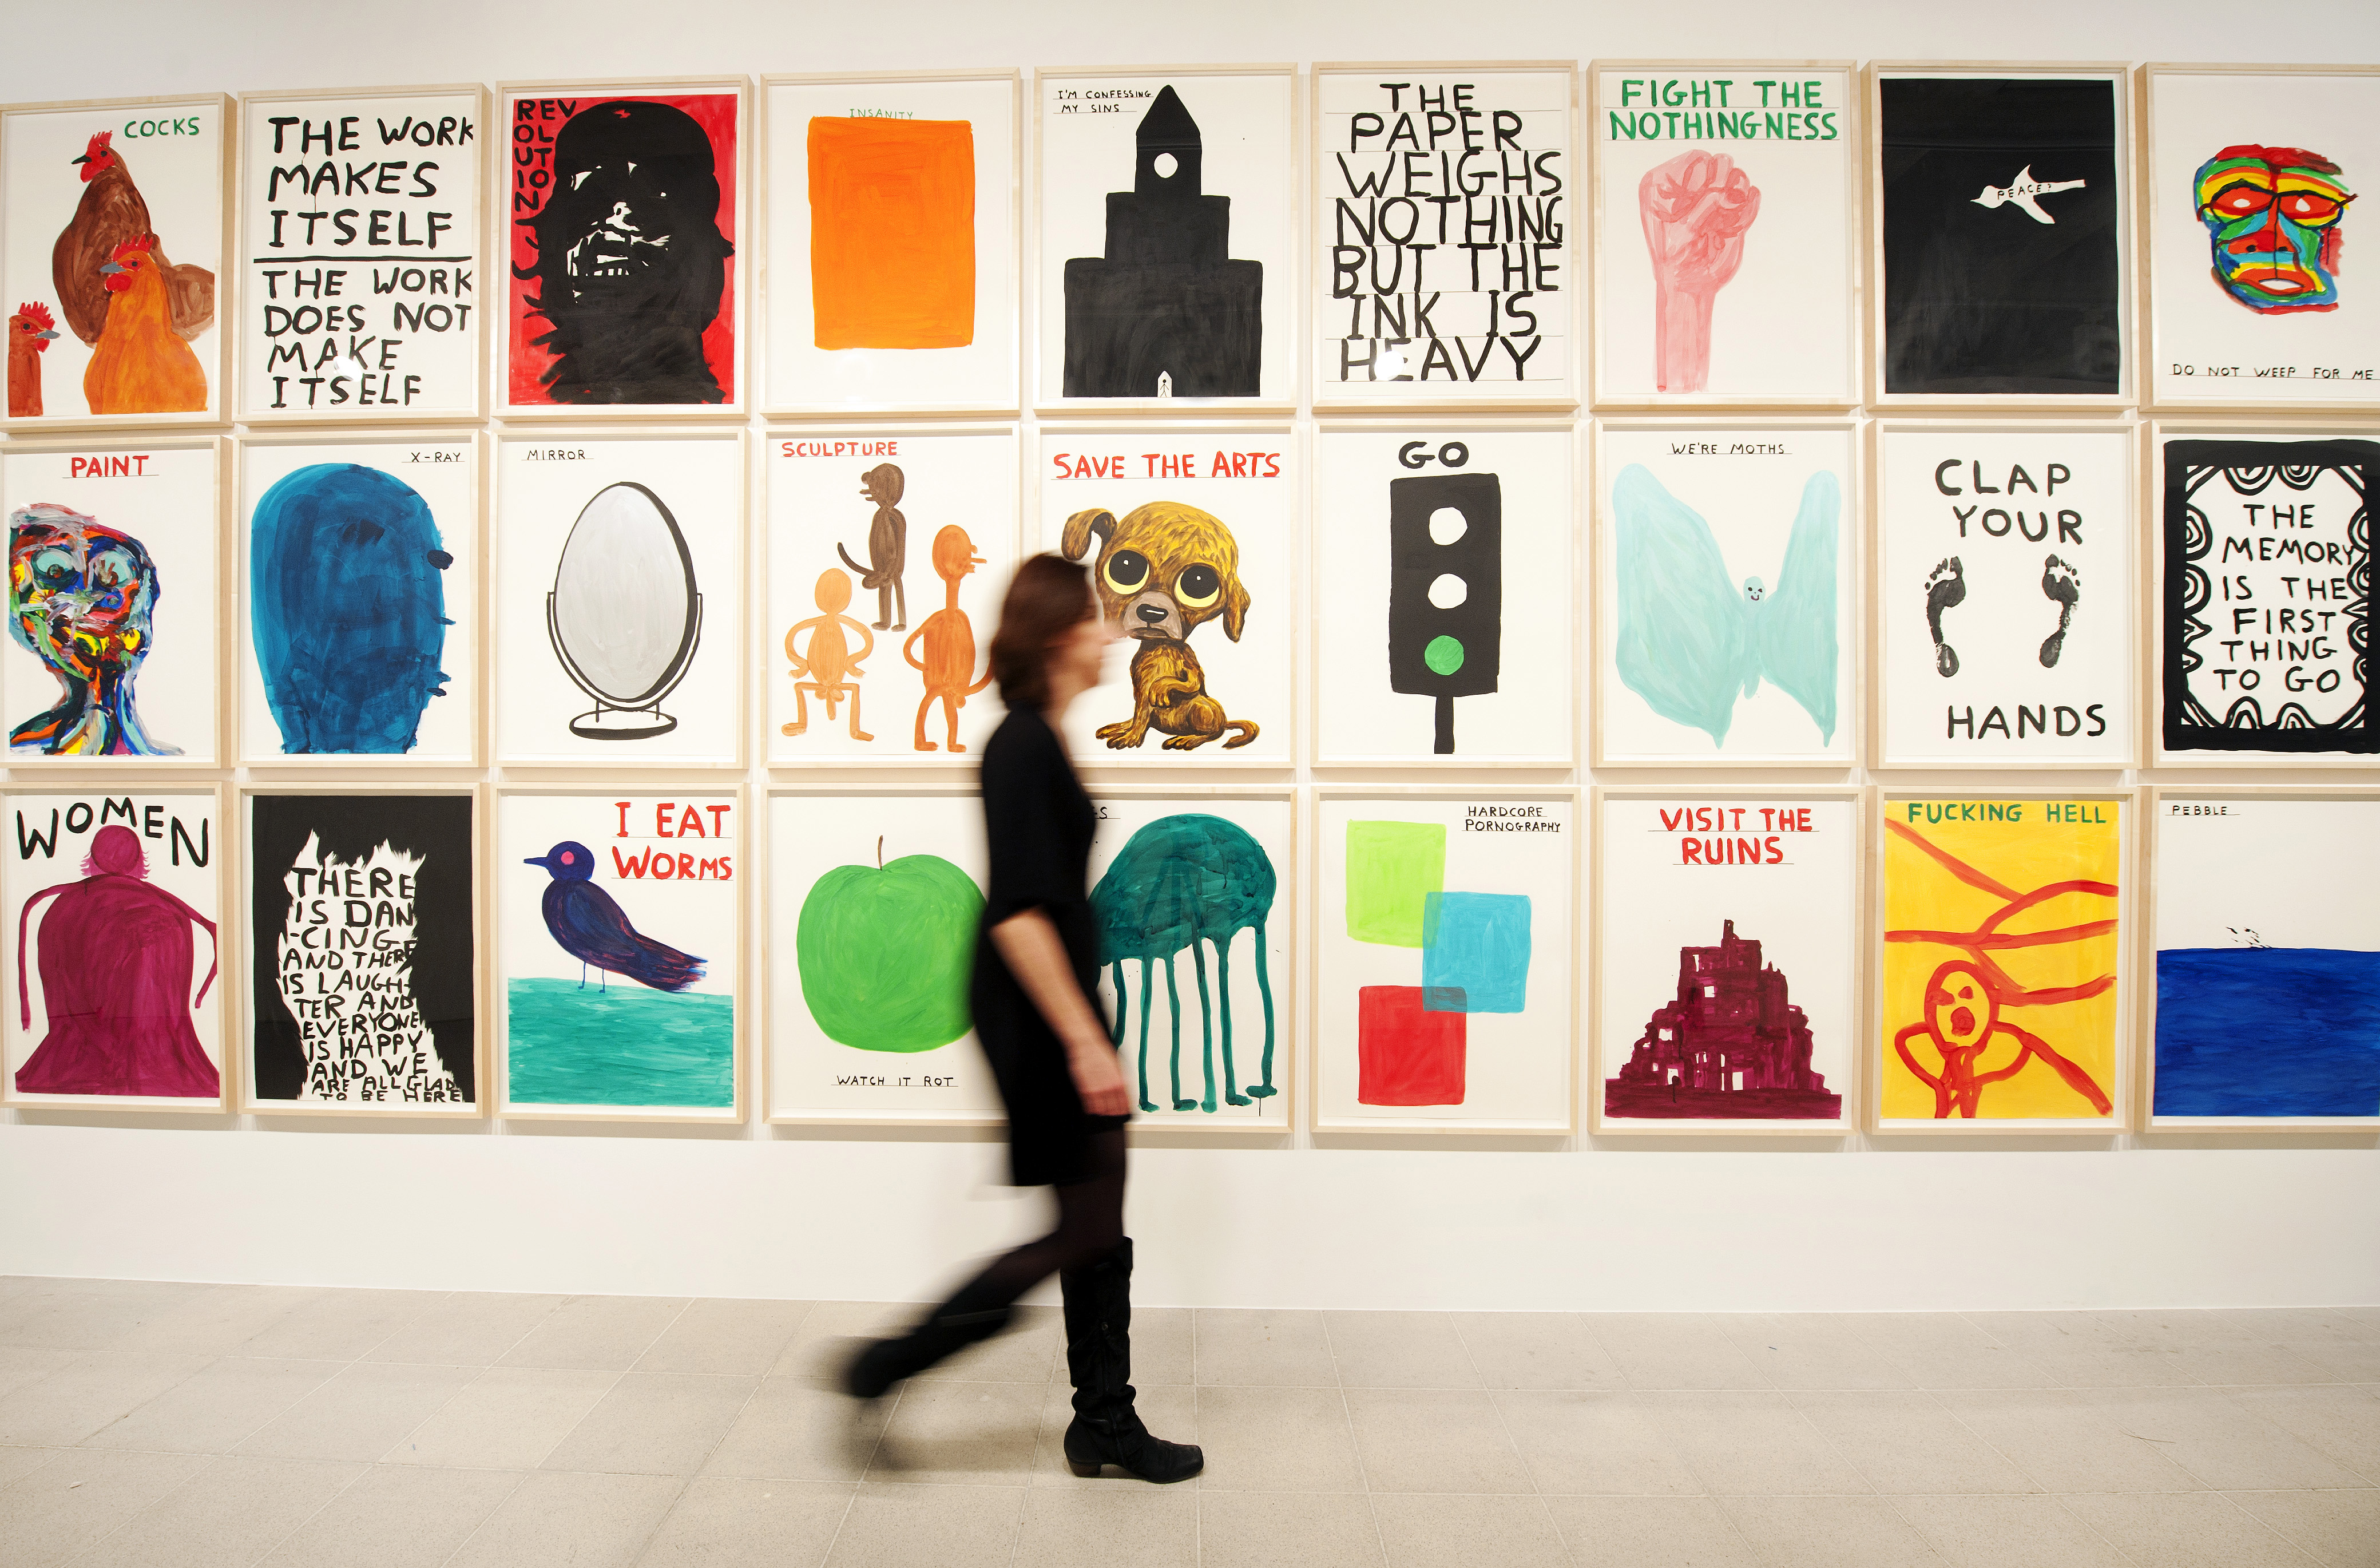 David Shrigley exhibition at Hayward Gallery, London. .Photo by Linda Nylind. 29/1/2012.